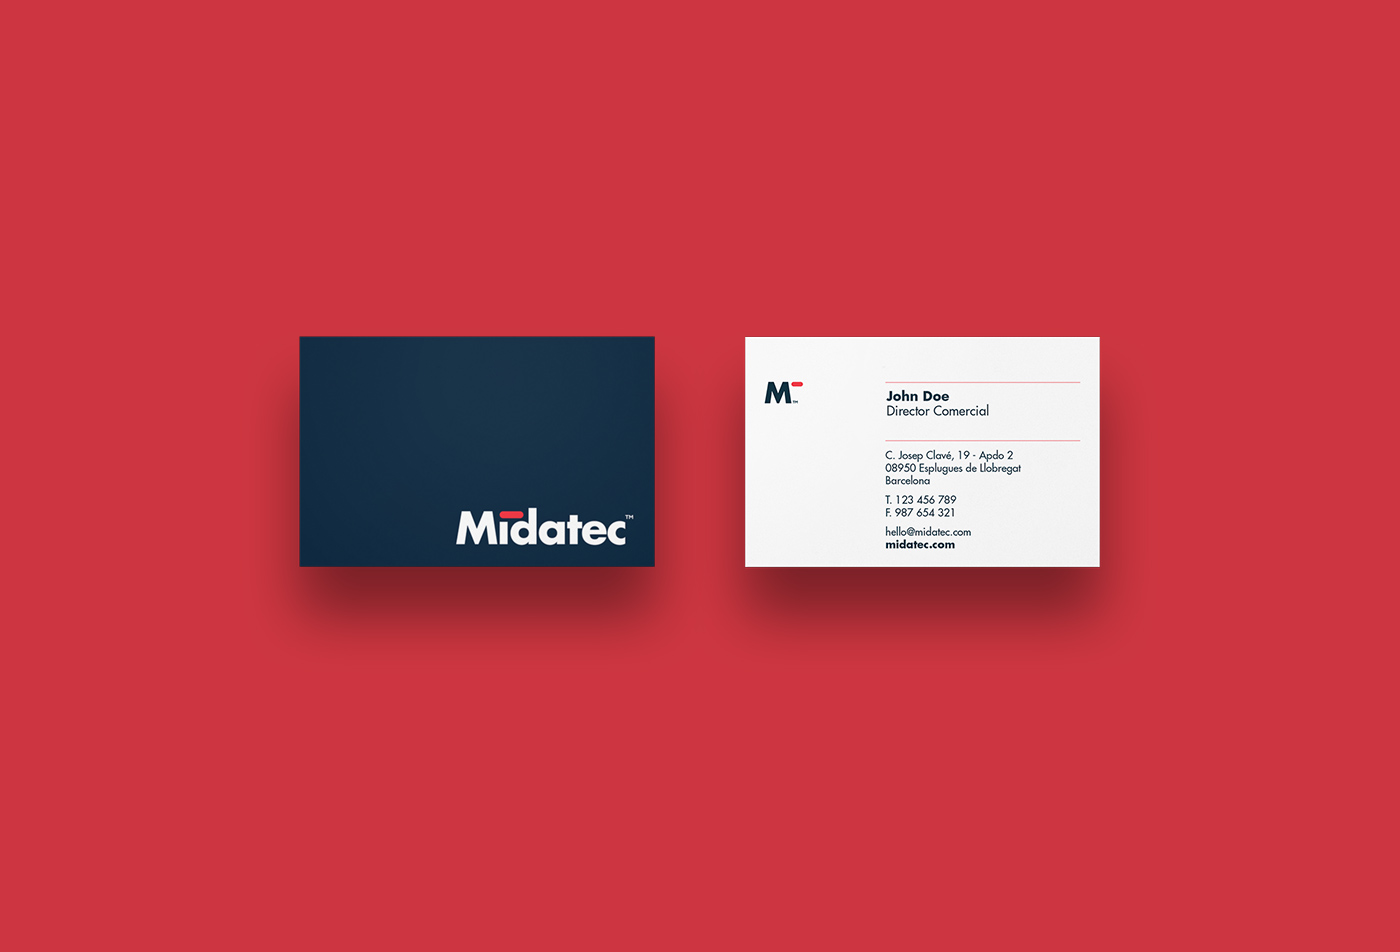 pixelarte-estudio-diseno-grafico-Diseno-tarjetas_comerciales-para-Midatec